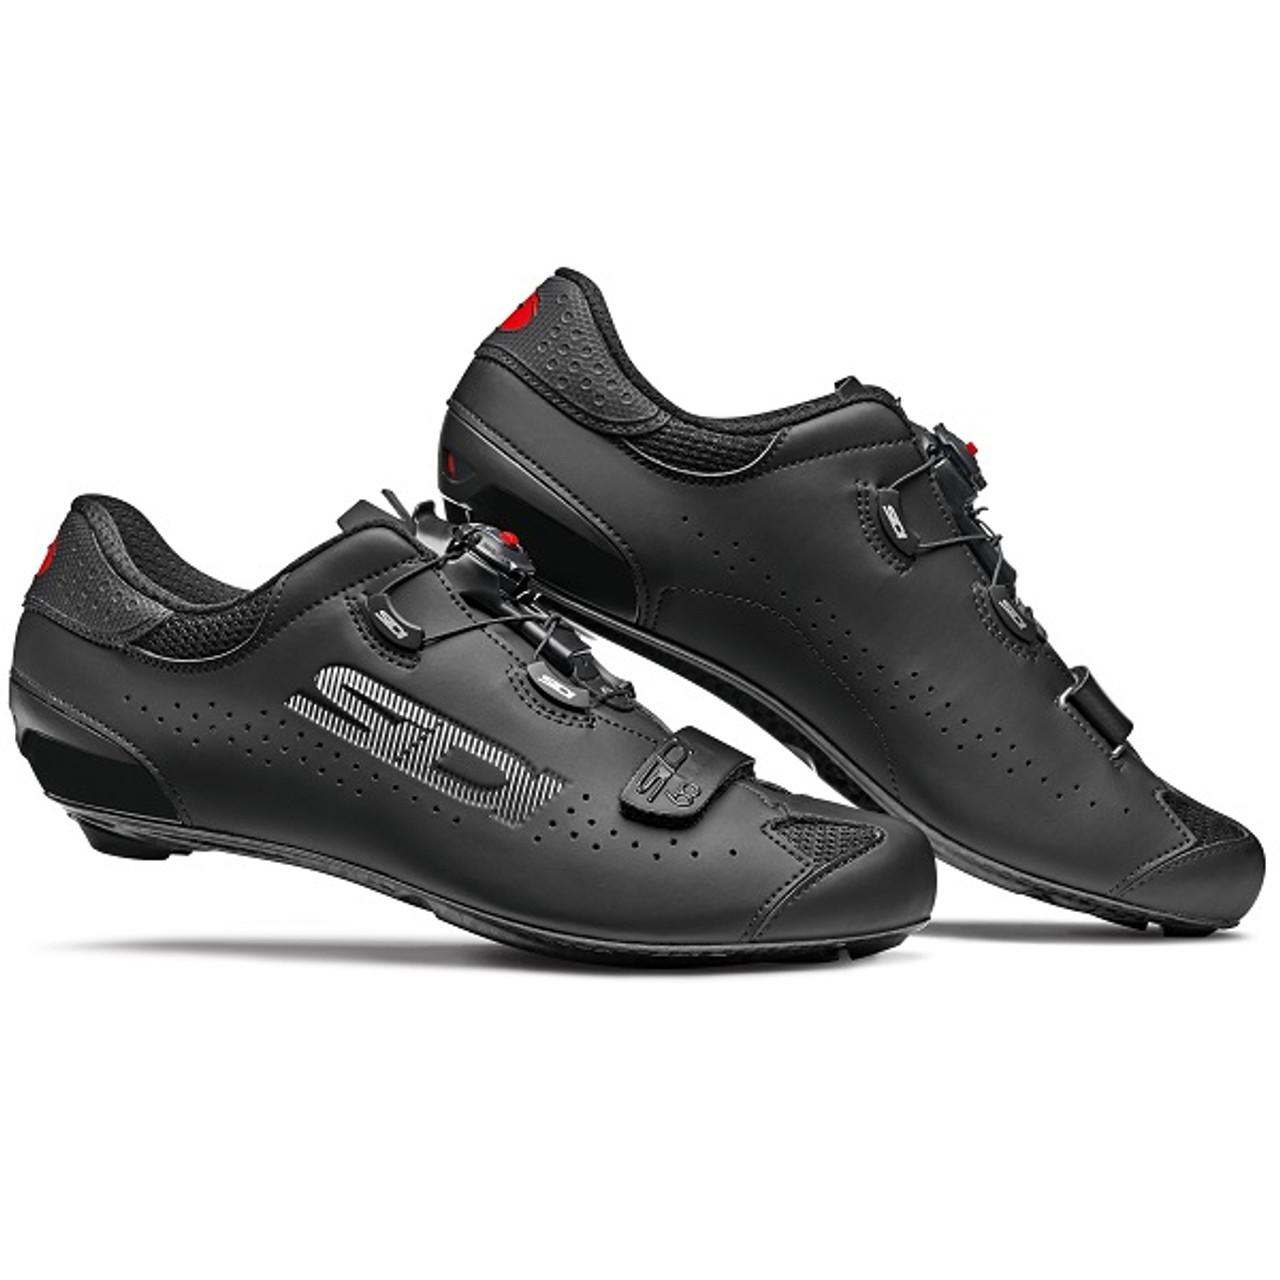 Sidi T-5 Air Triathlon Bicycle Cycle Bike Shoes Black Black